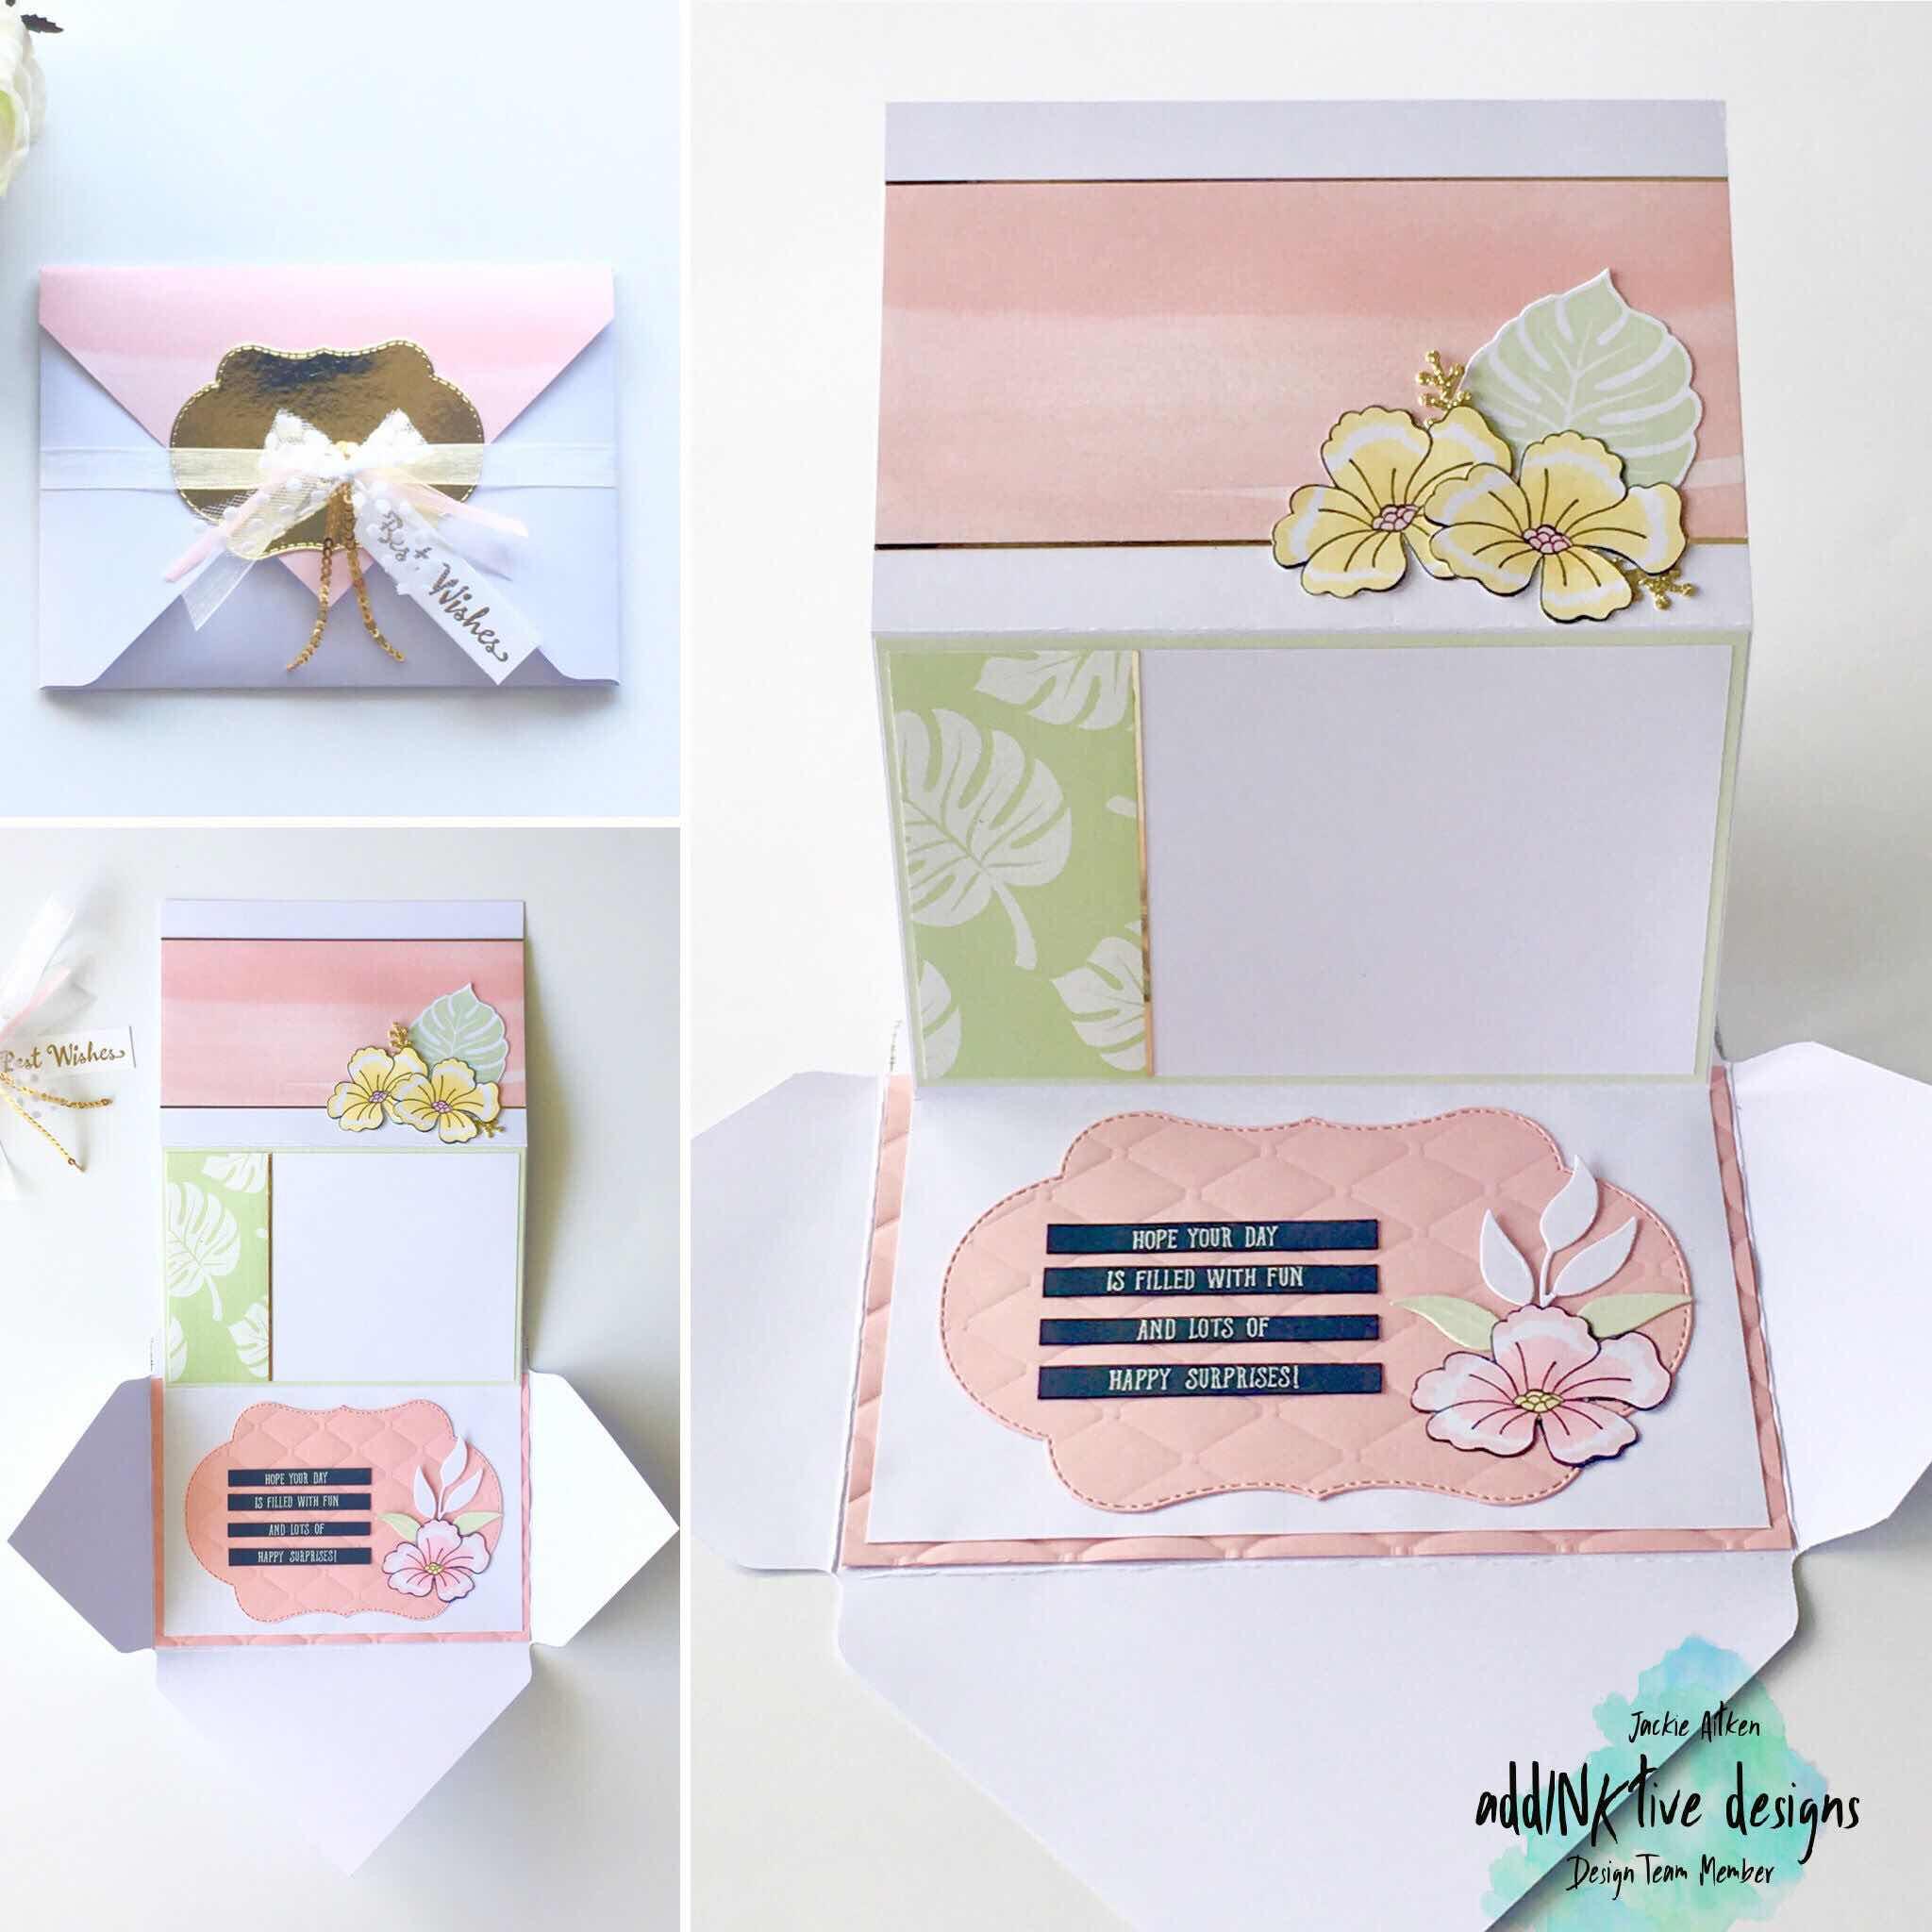 stampin up blended seasons, pocket card, postal card pals, tropical chic